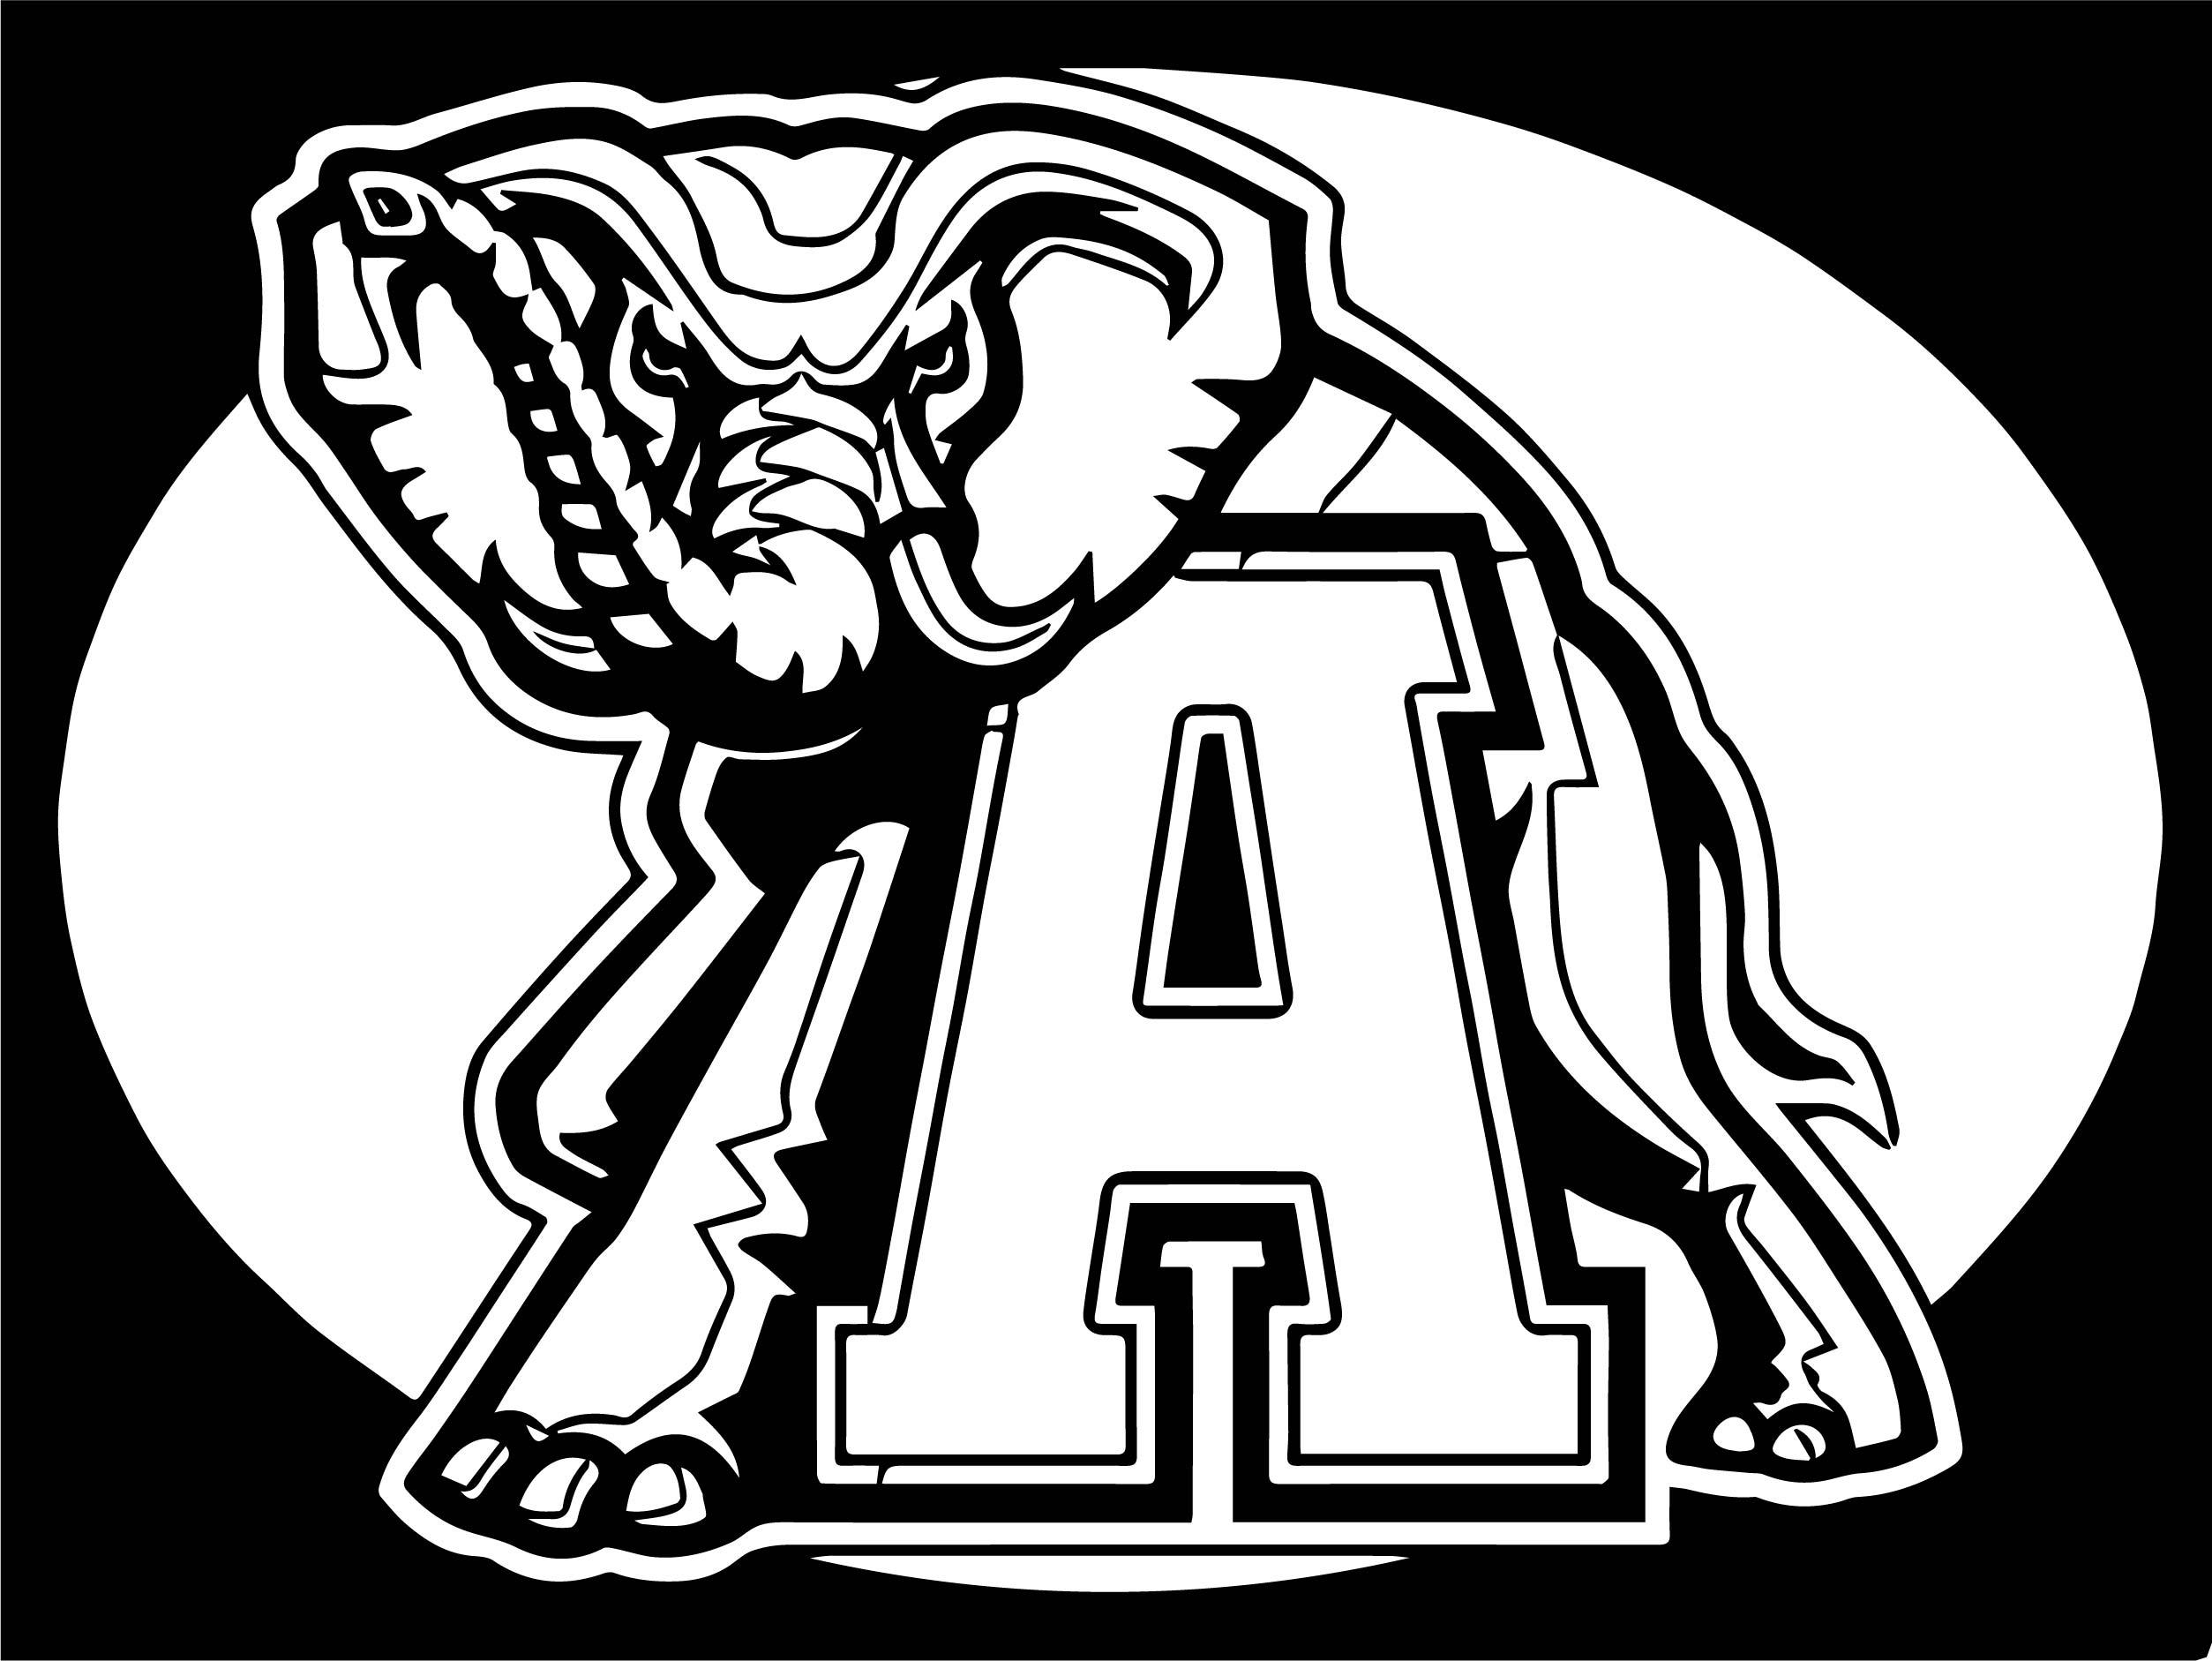 2507x1882 Cool Coloring Pages Nfl Teams Logos Atlanta Falcons Football Team